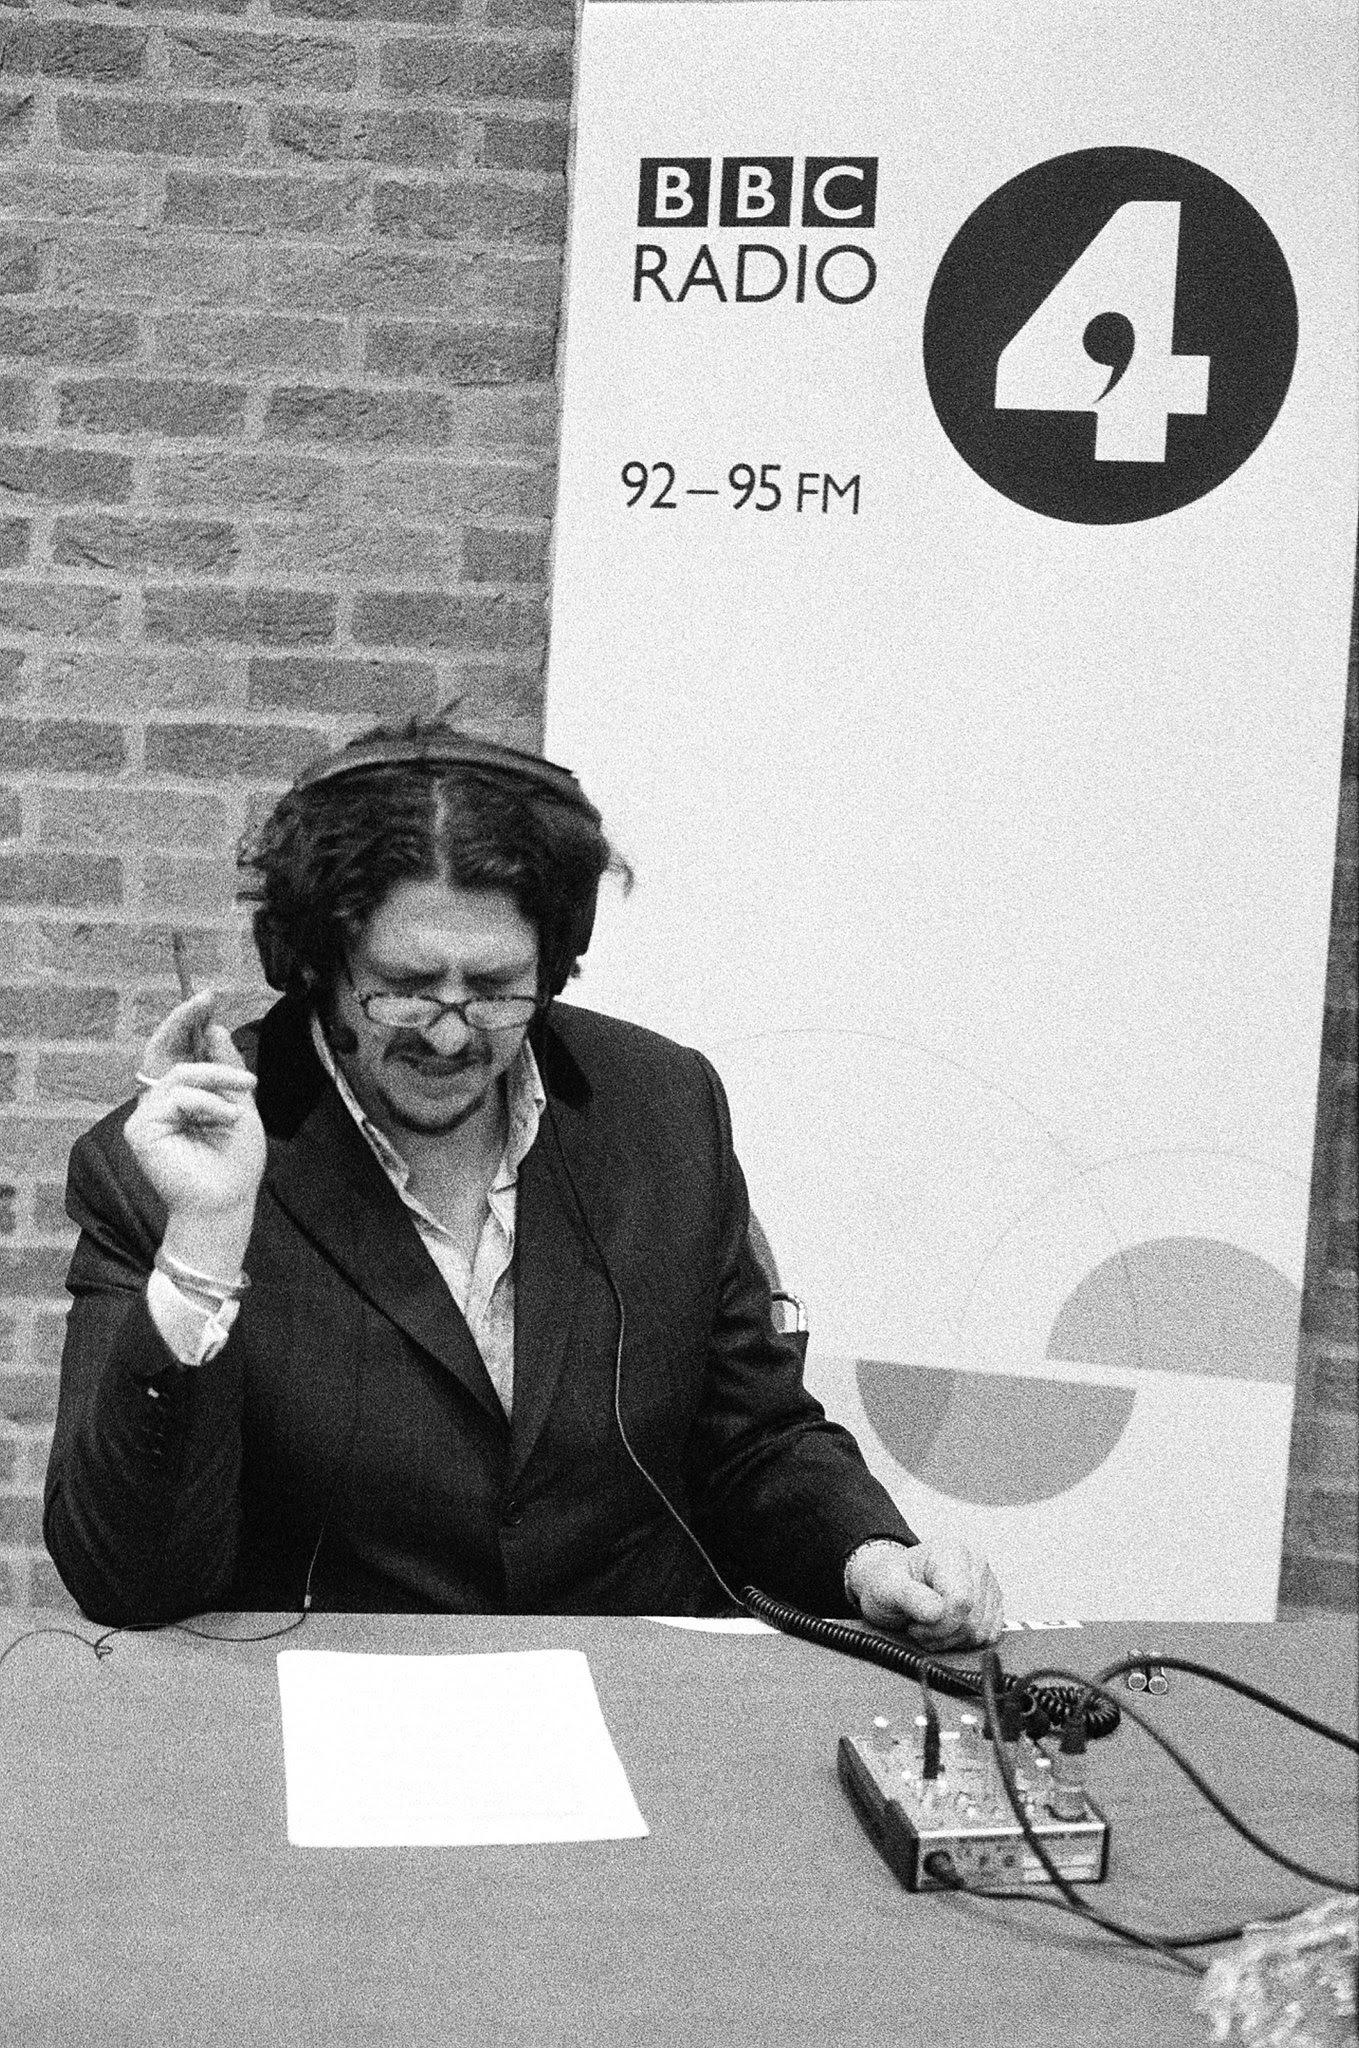 of Radio 4's The Kitchen Cabiat Clare College in Cambridge